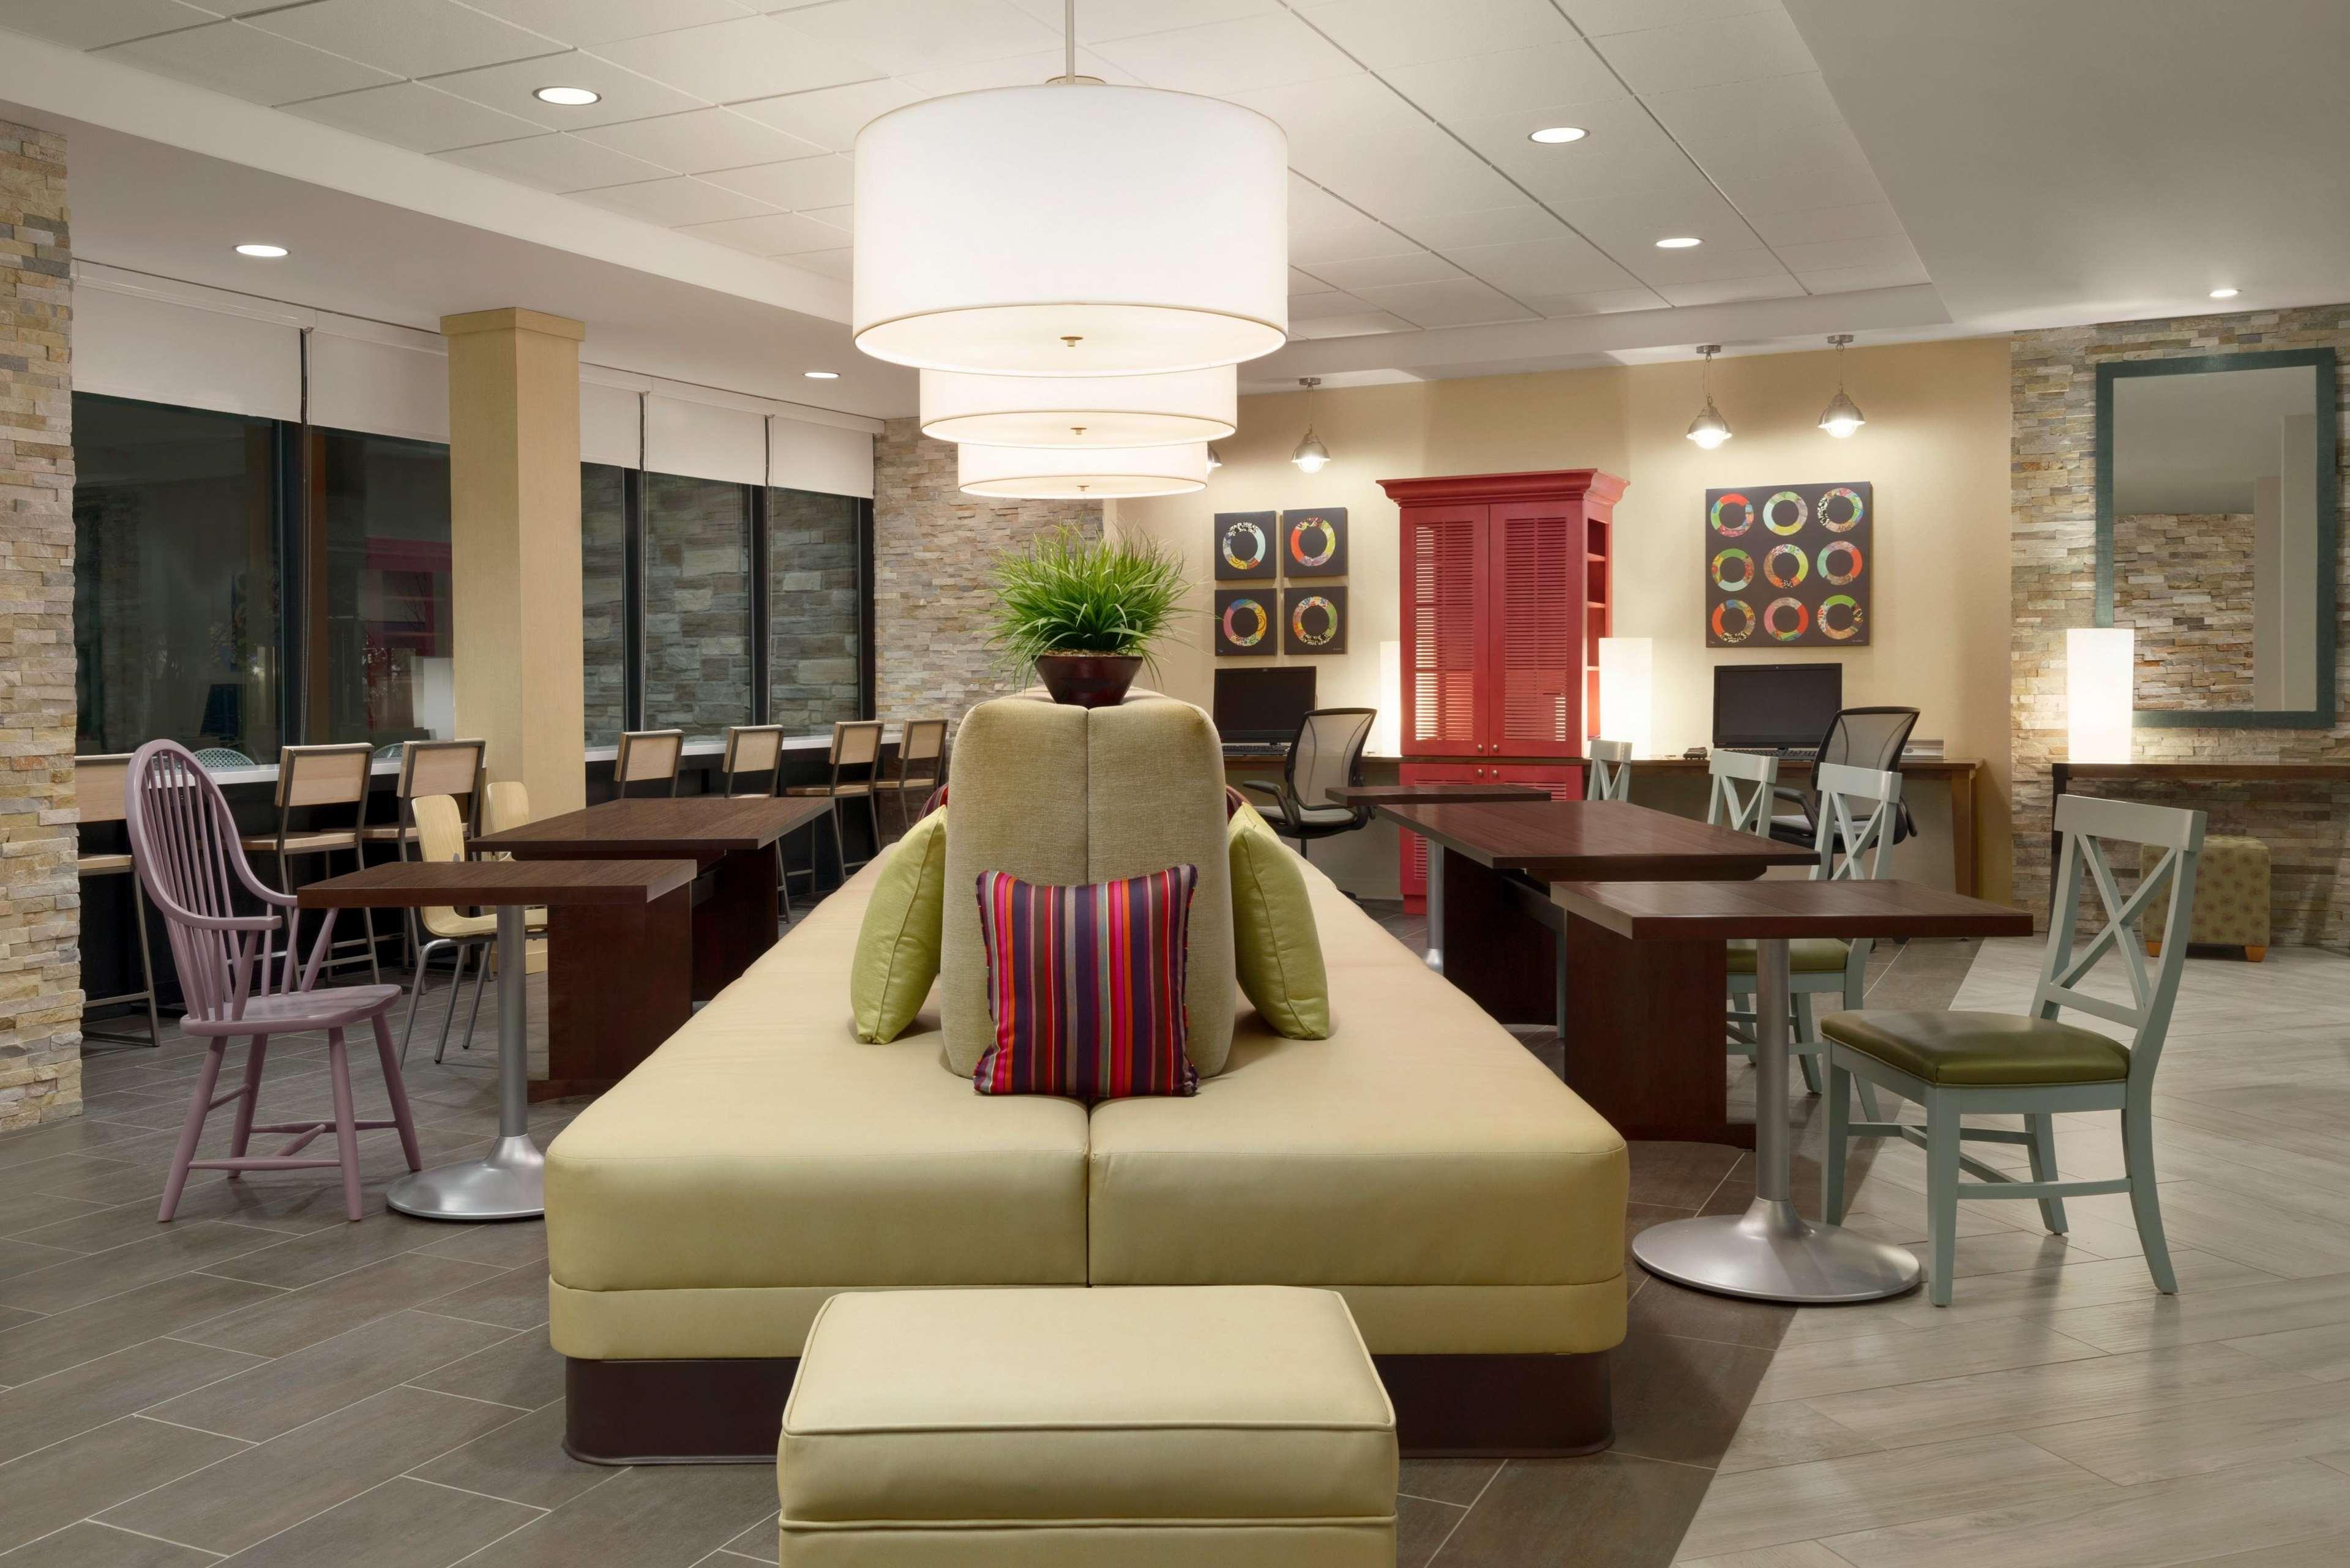 Home2 Suites by Hilton Leavenworth Downtown image 6